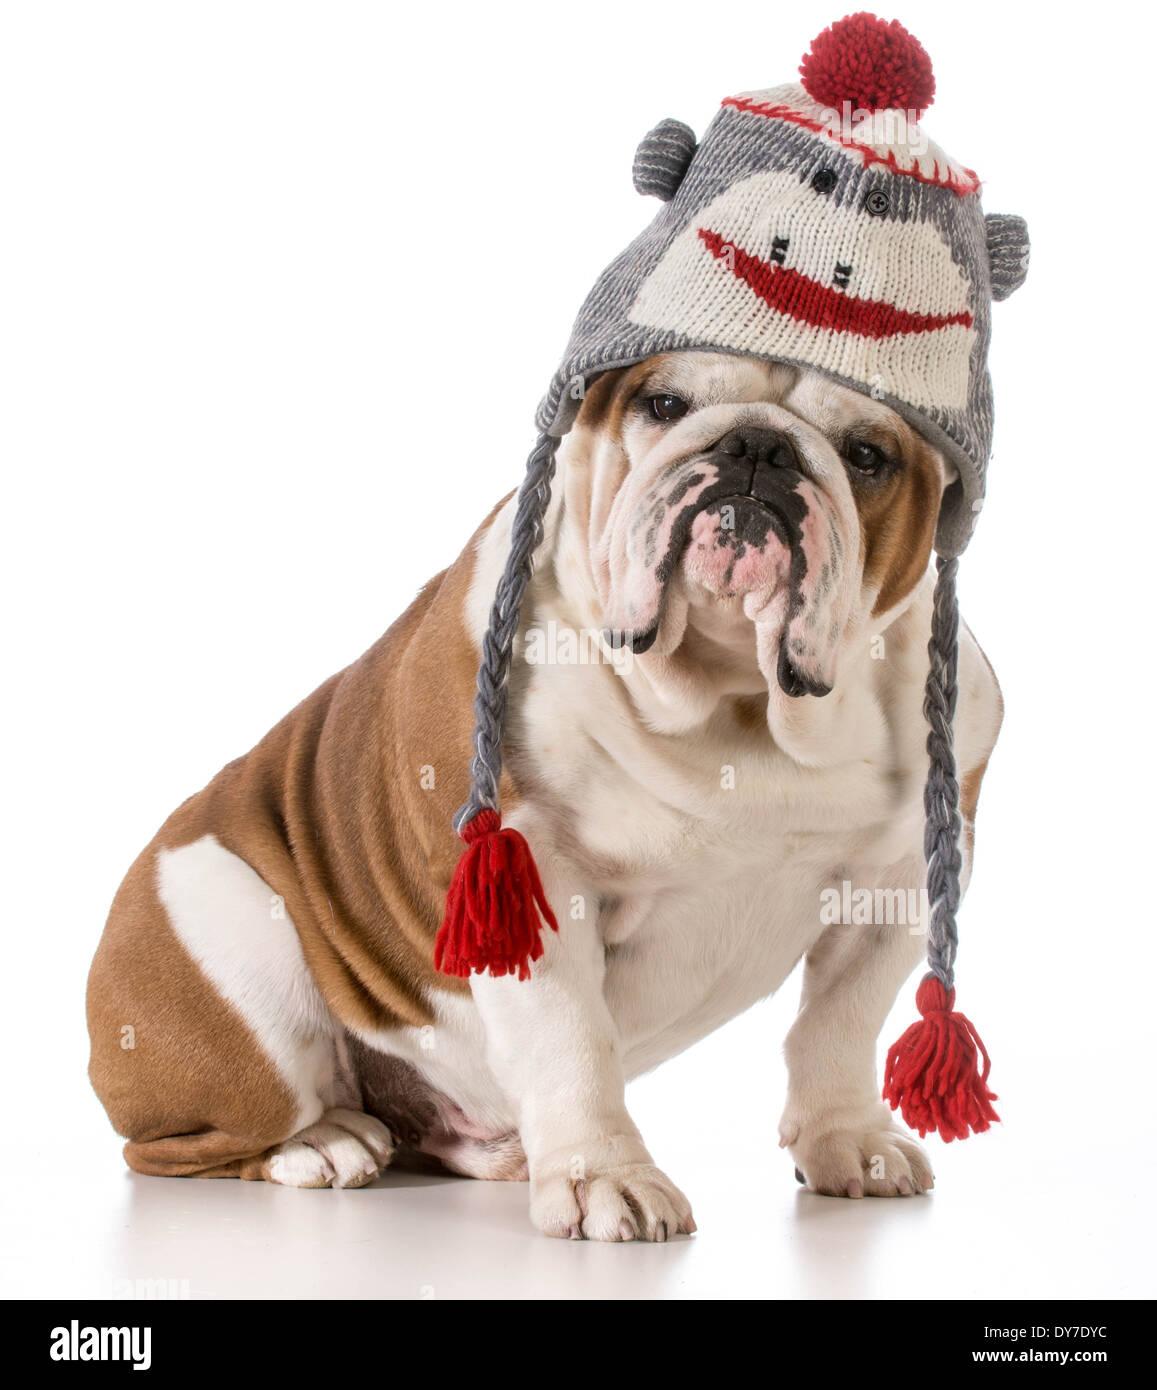 Cane indossando Cappello invernale Foto   Immagine Stock  68391440 ... d6d34d8a12f6